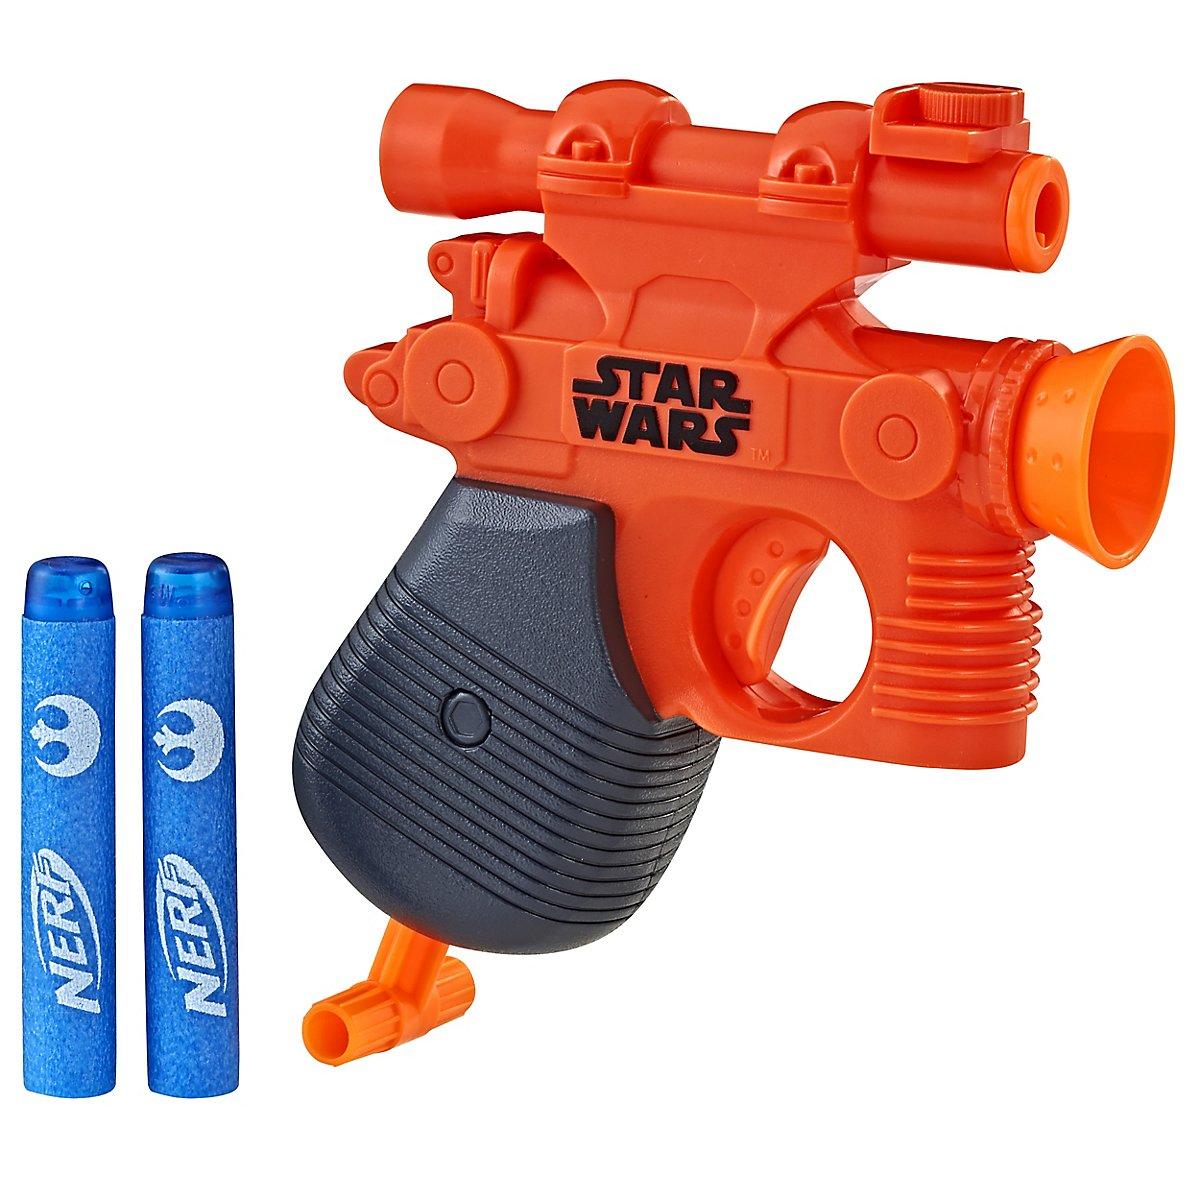 Nerf Microshots Star Wars Han Solo